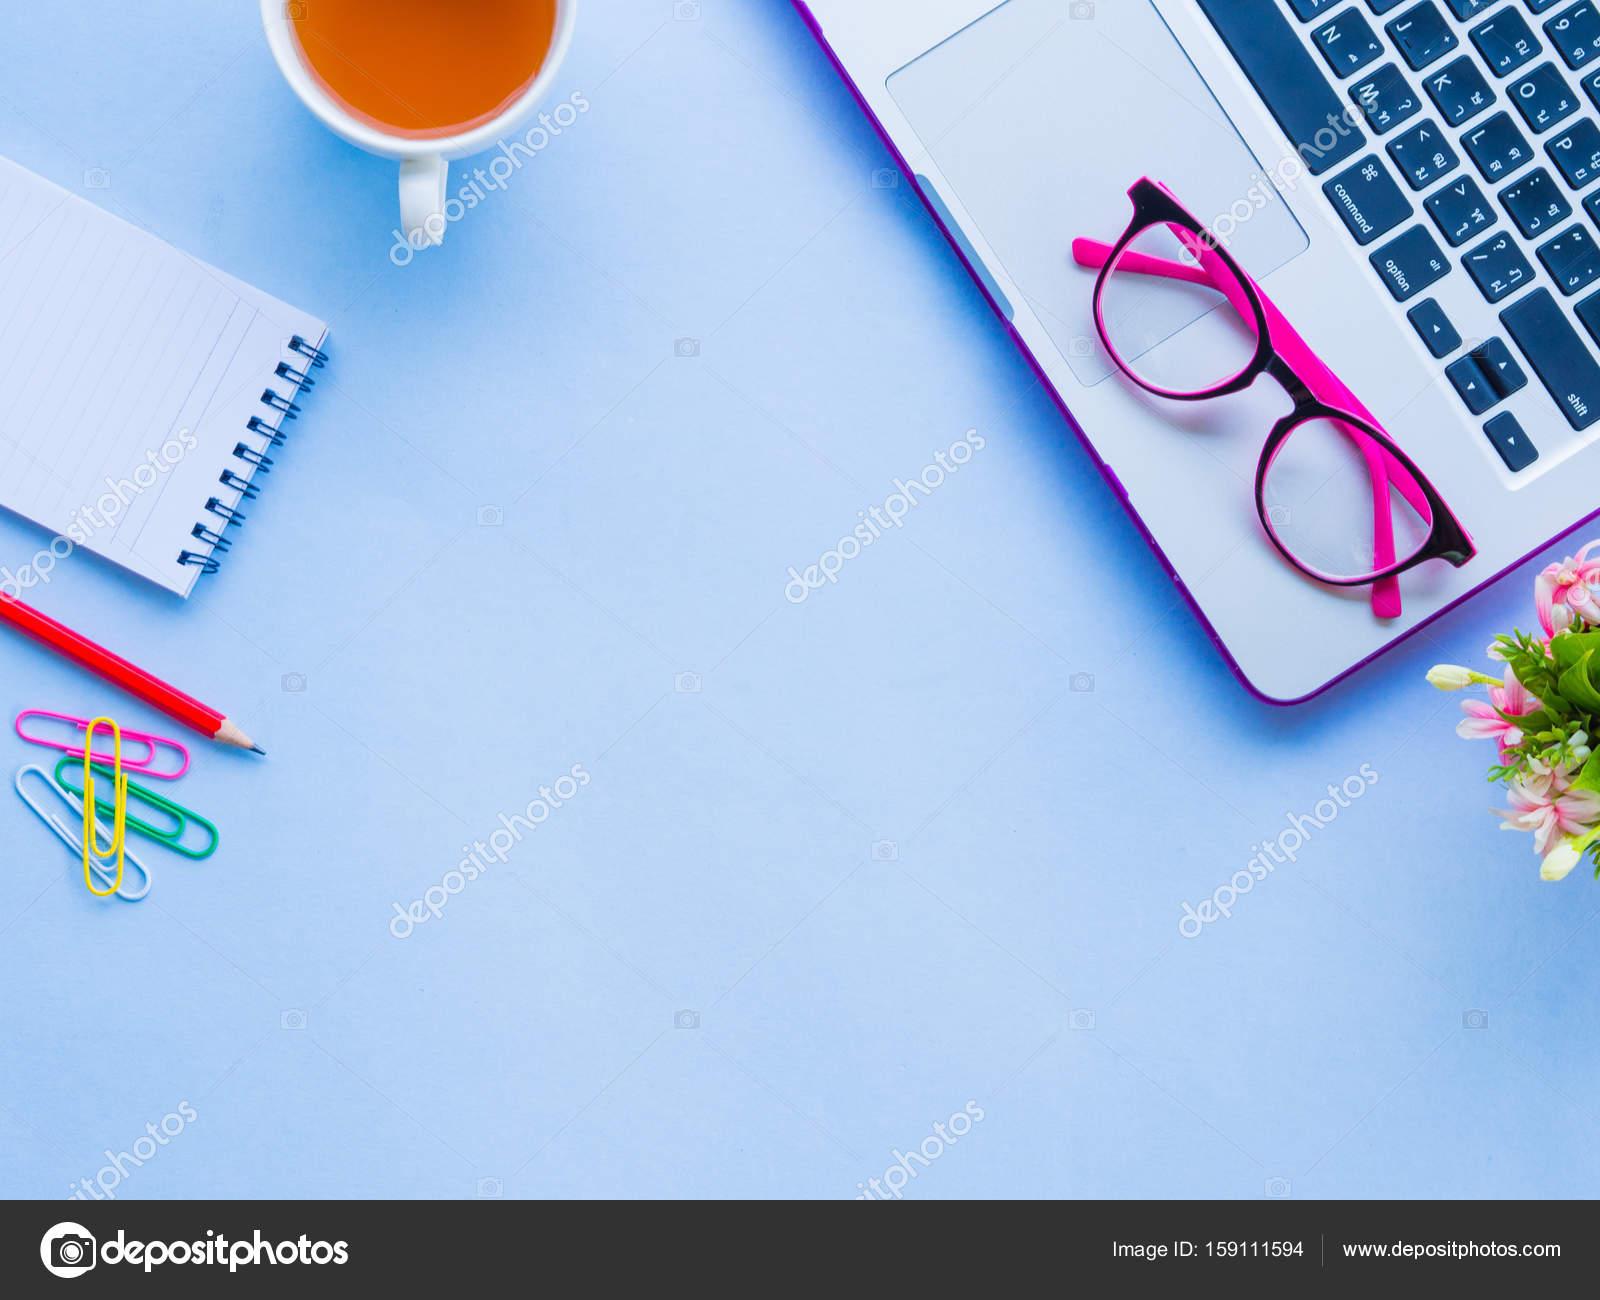 Graphic Designer Flat Lay